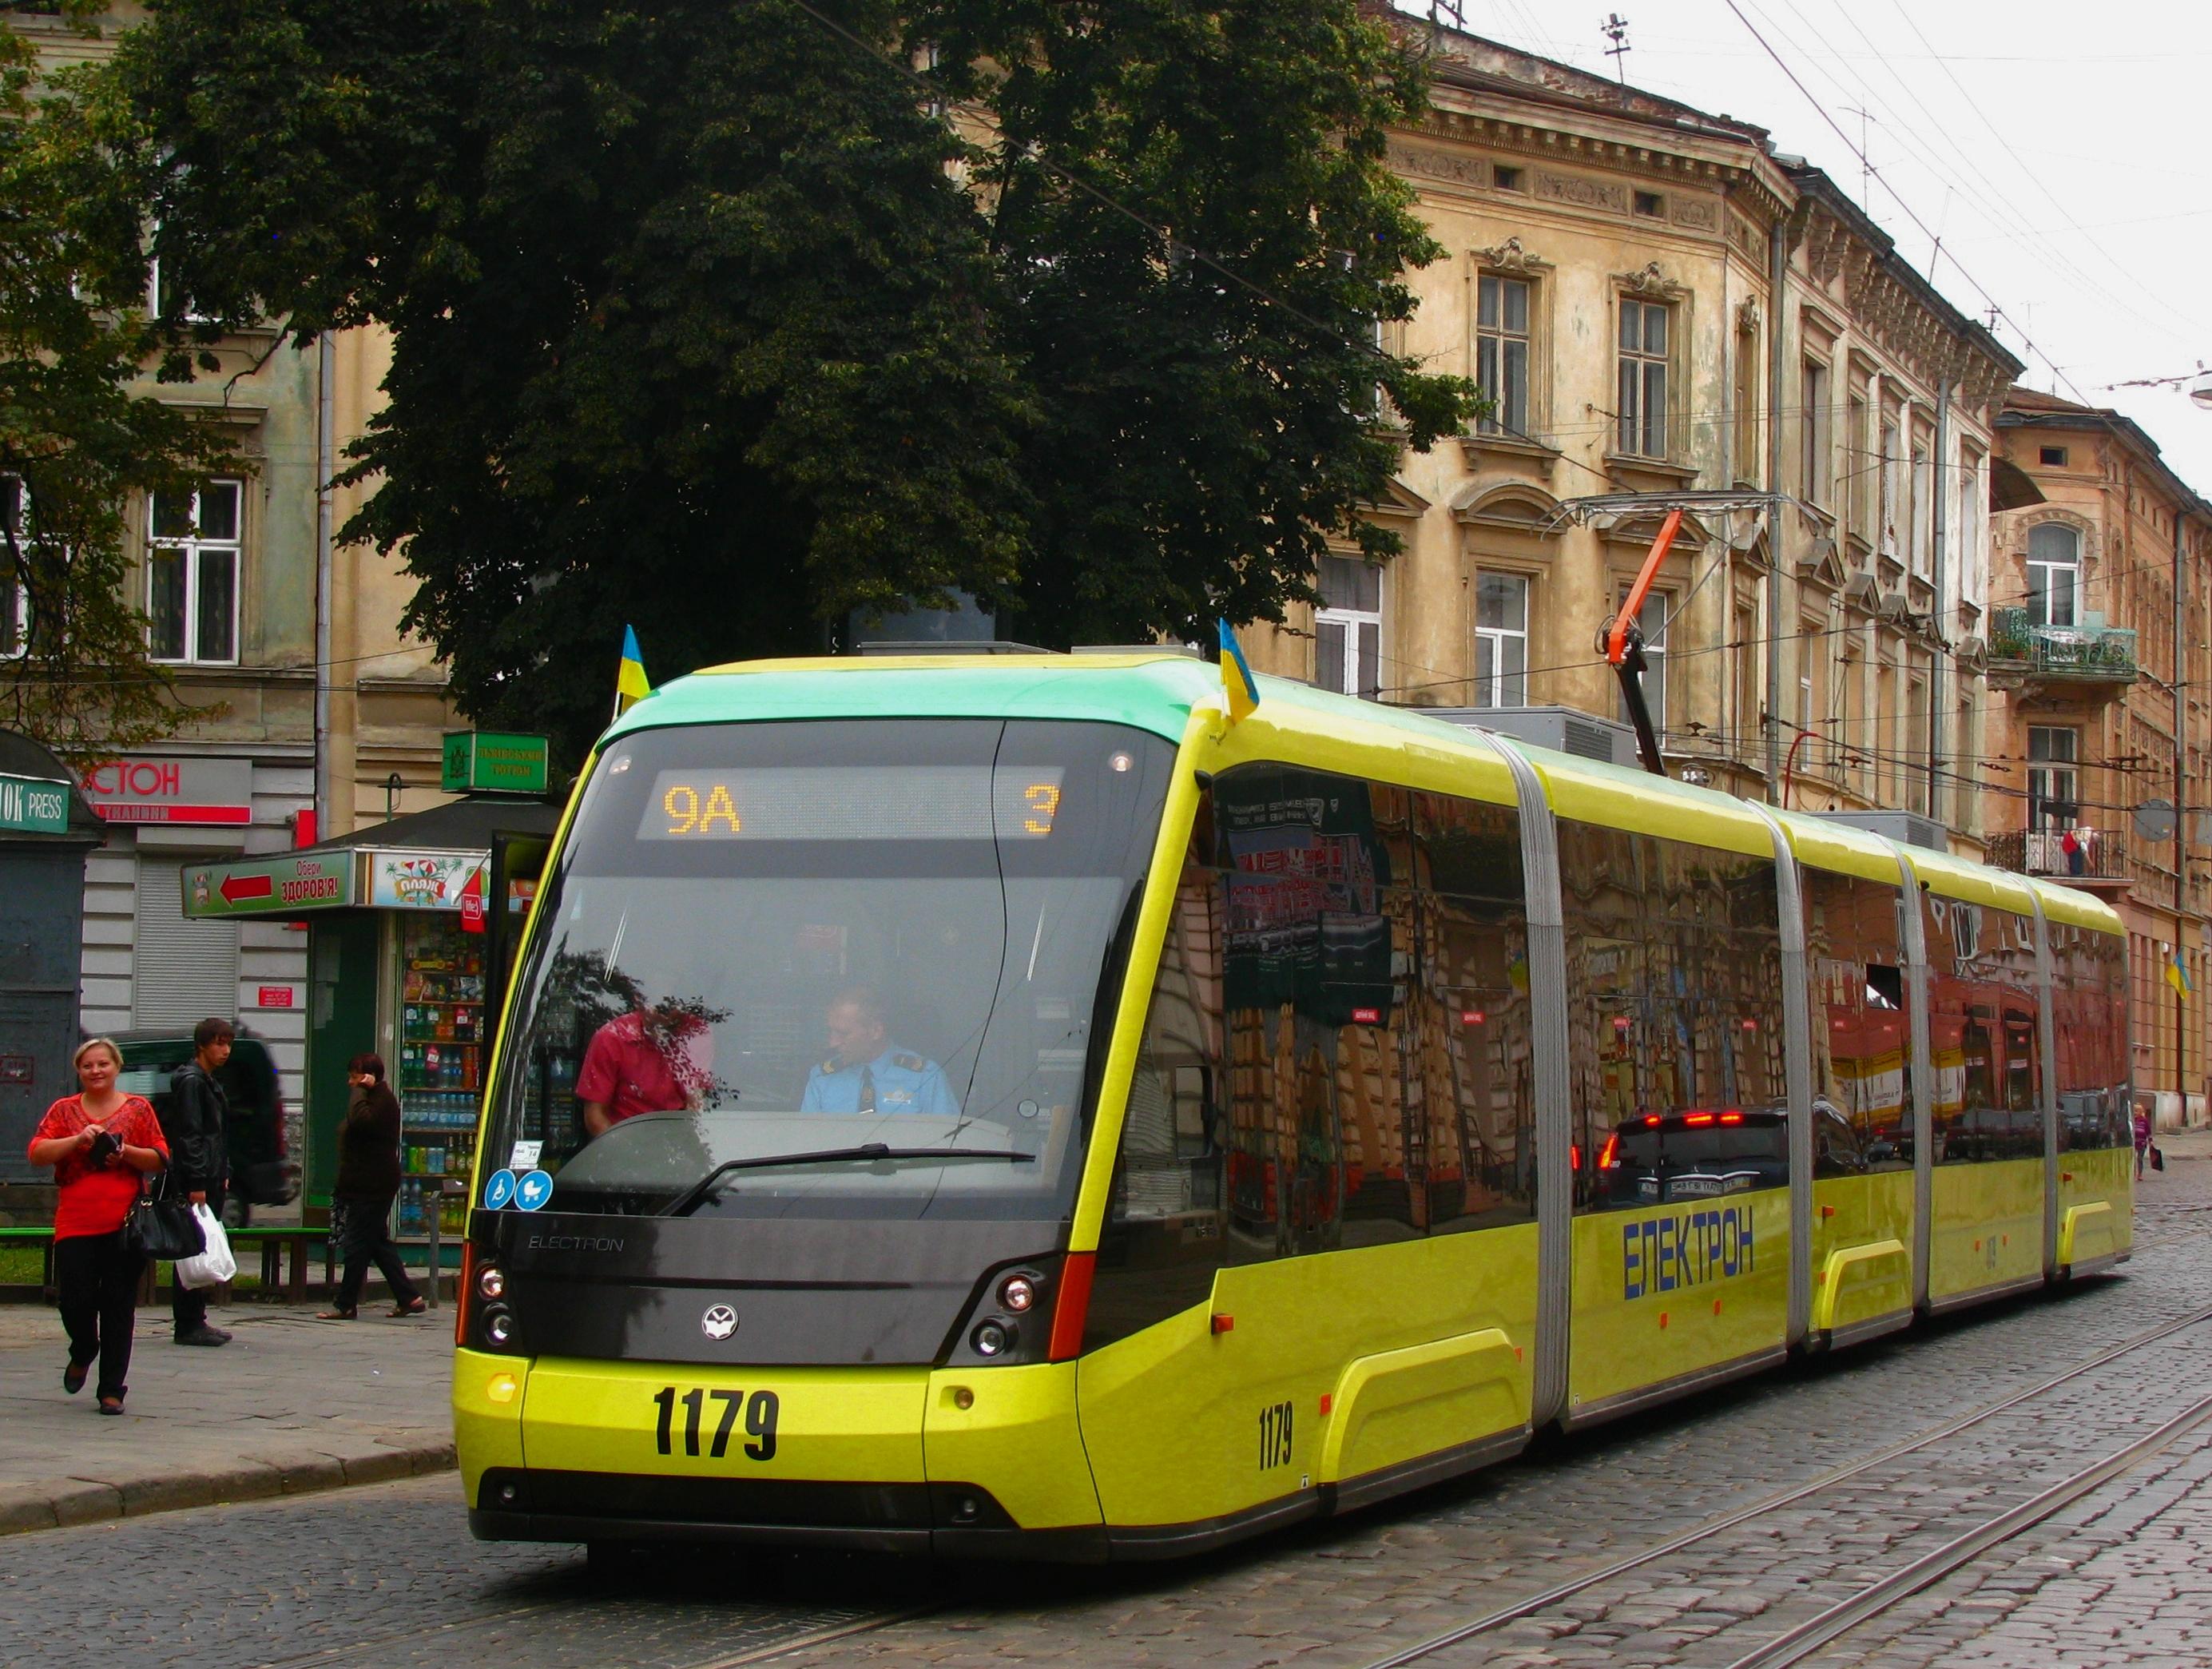 Трамвай сошел с рельсов в Одессе: погиб 25-летний мужчина - Цензор.НЕТ 2490